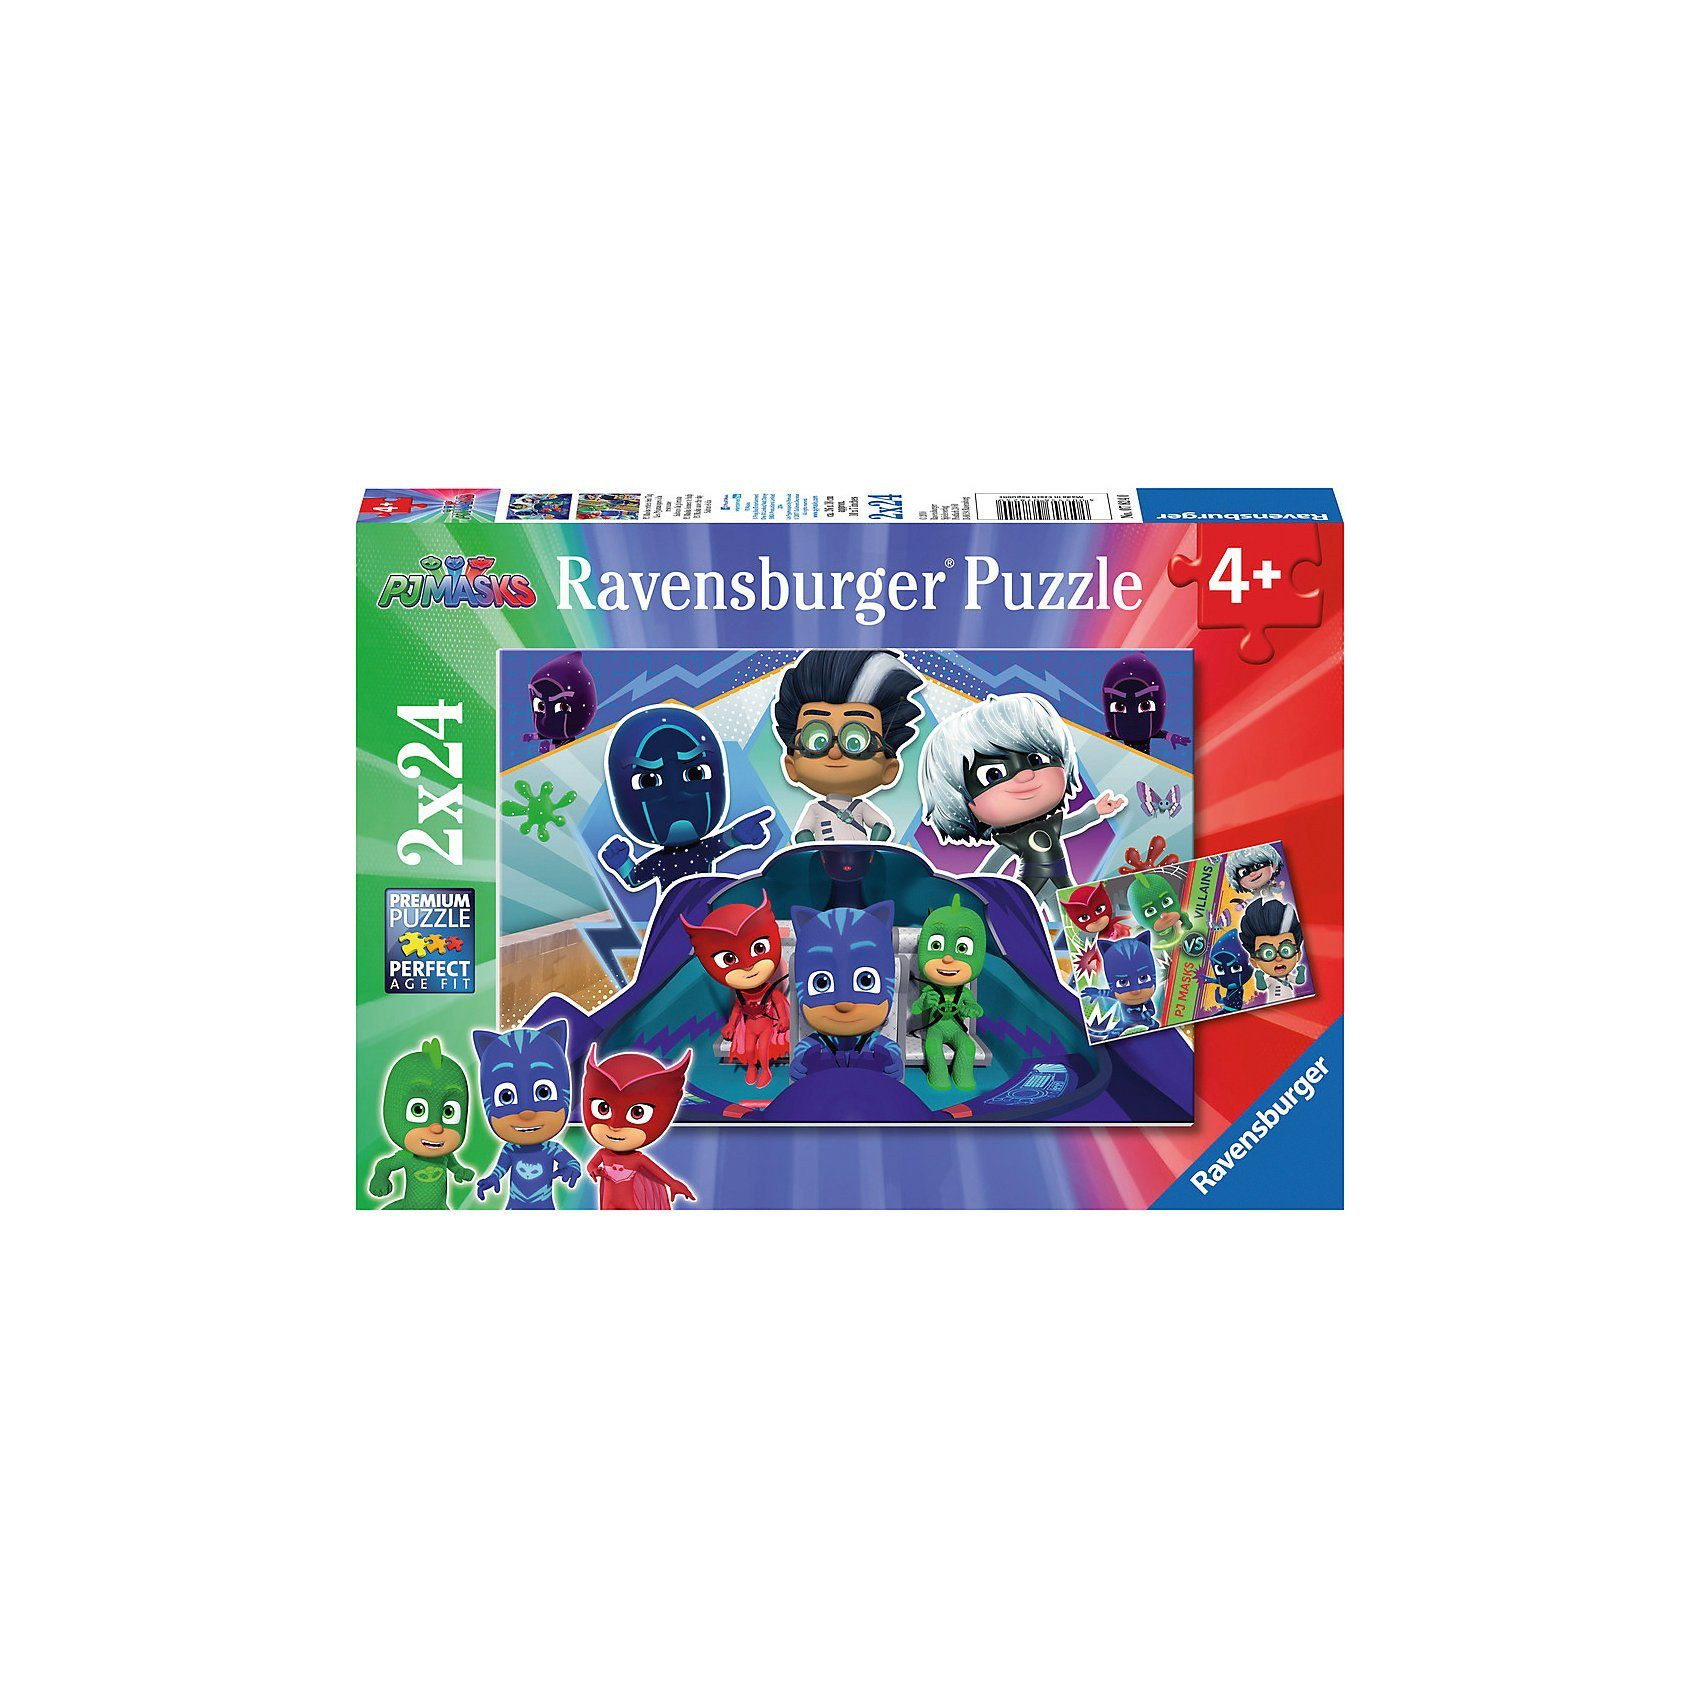 Ravensburger Puzzleset 2 x 24 Teile PJ Masks retten den Tag